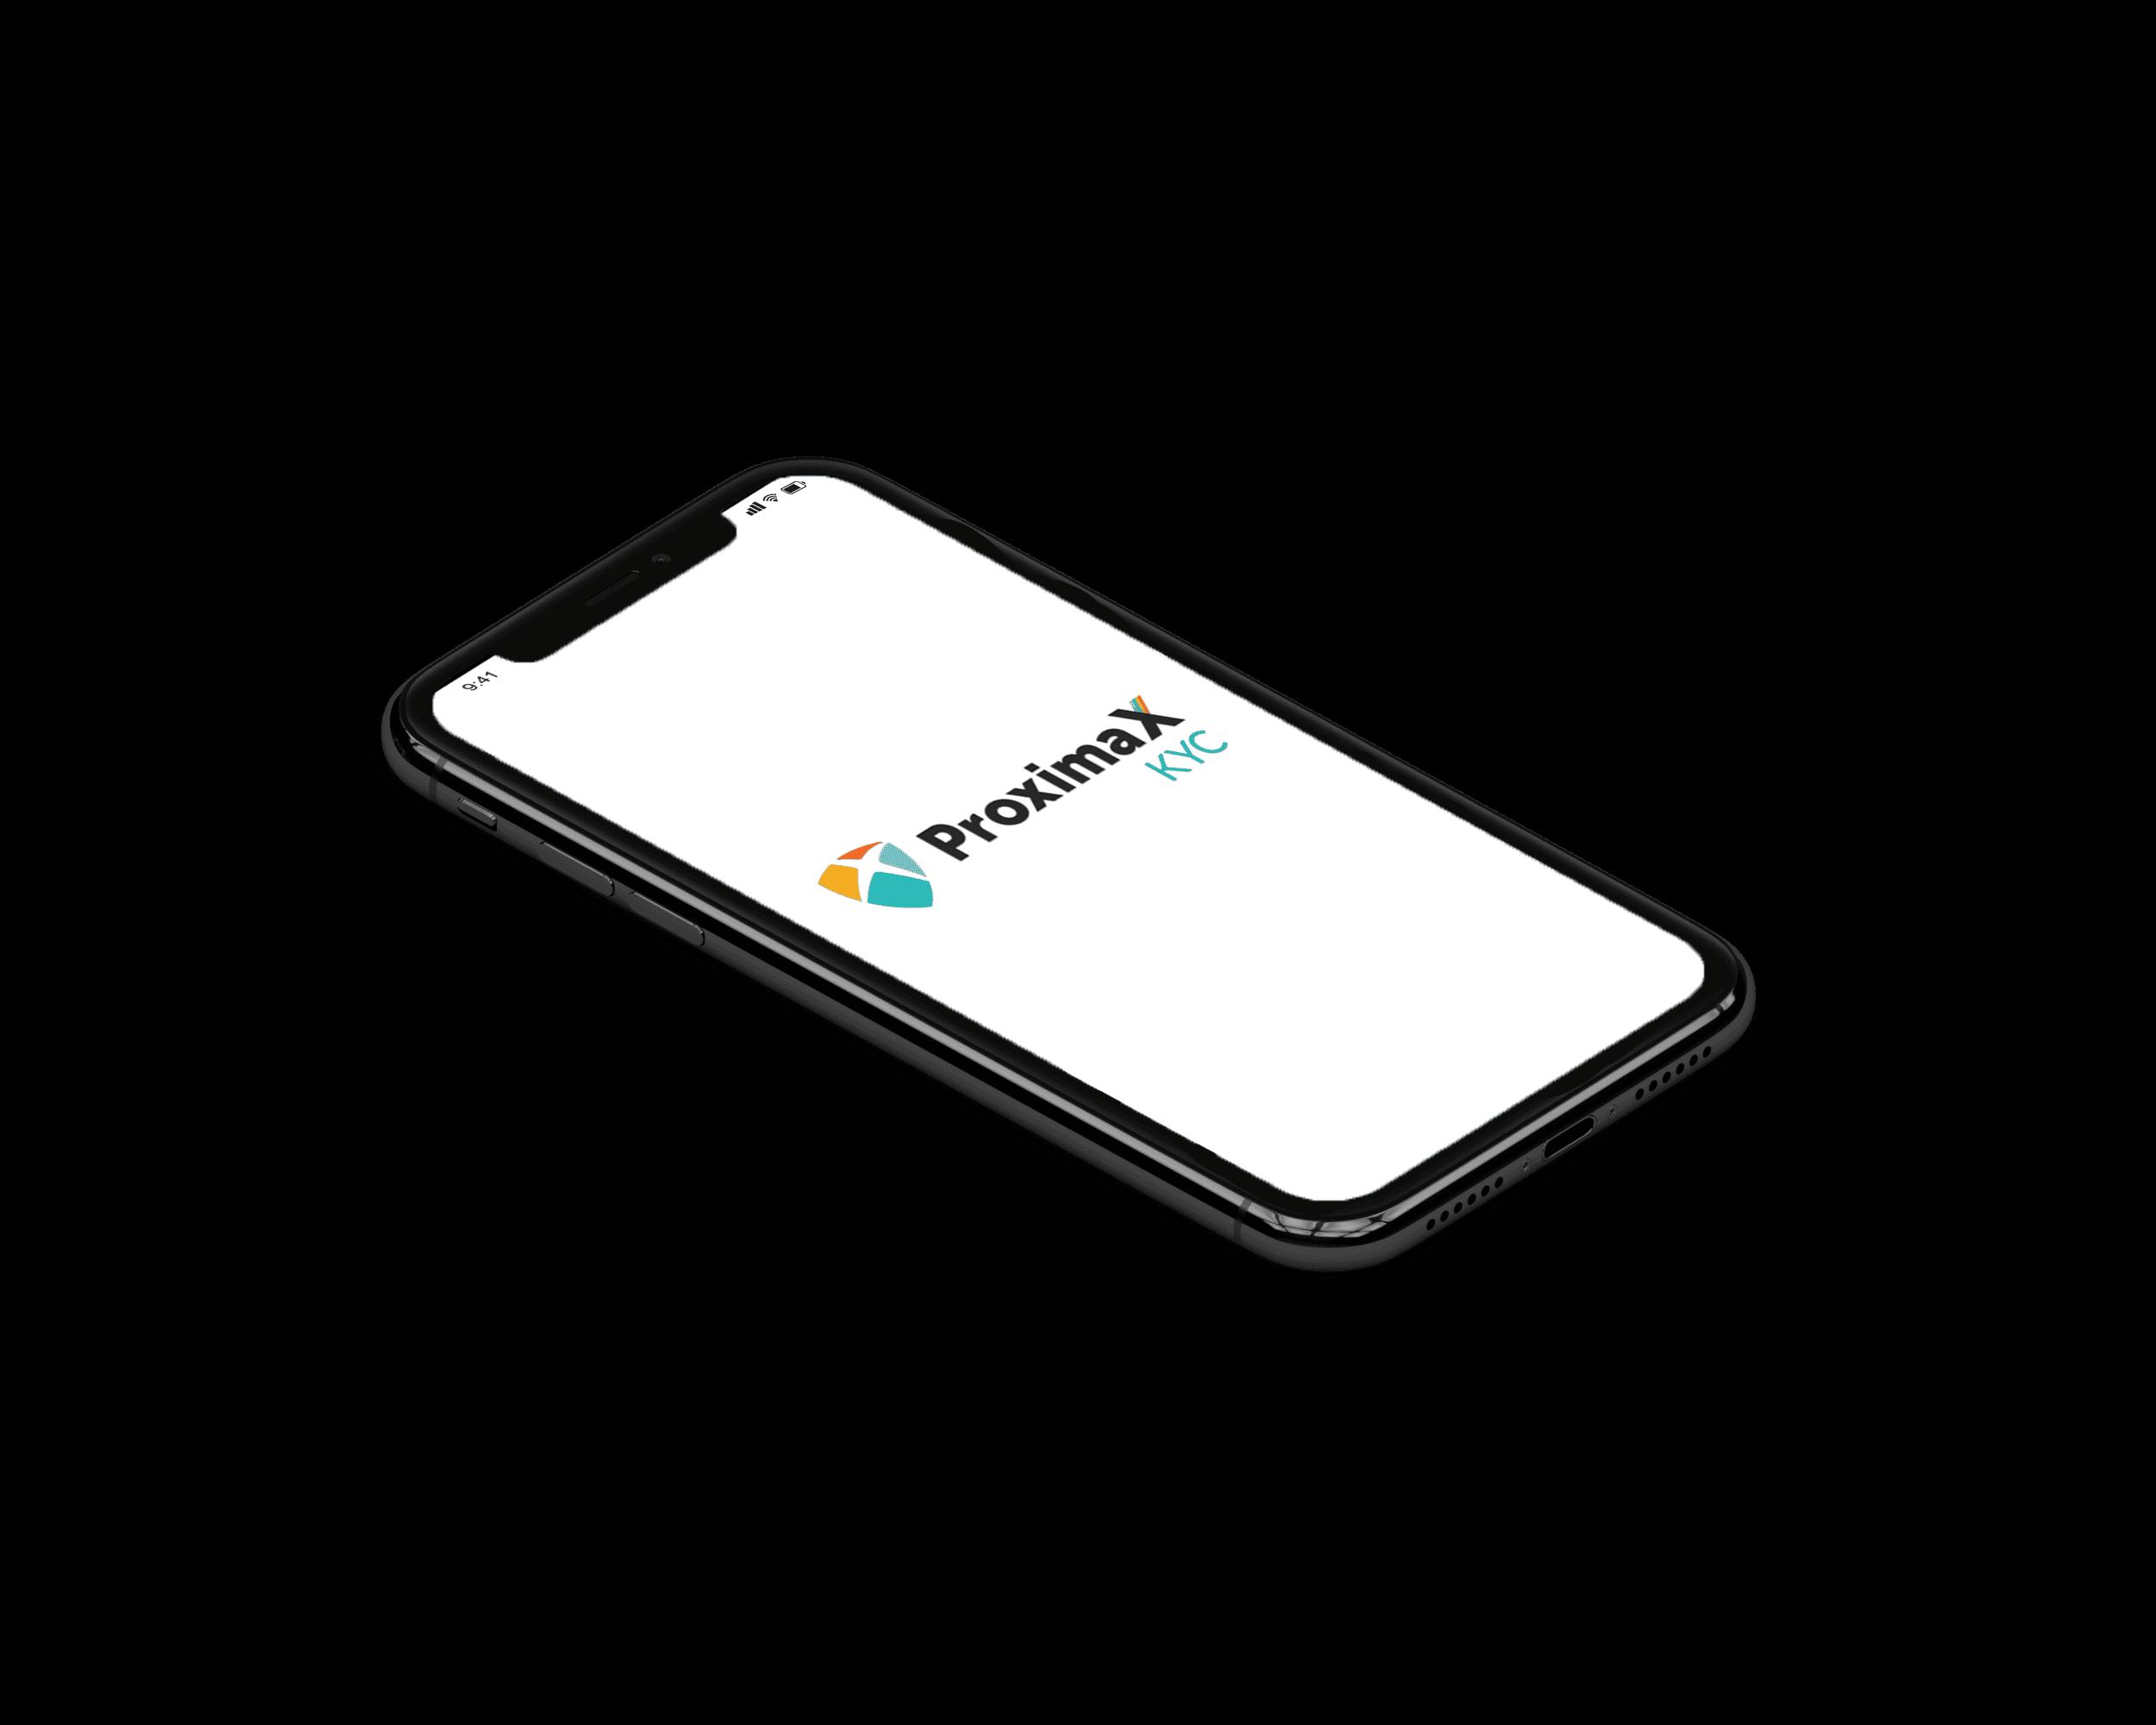 kyc proximax app